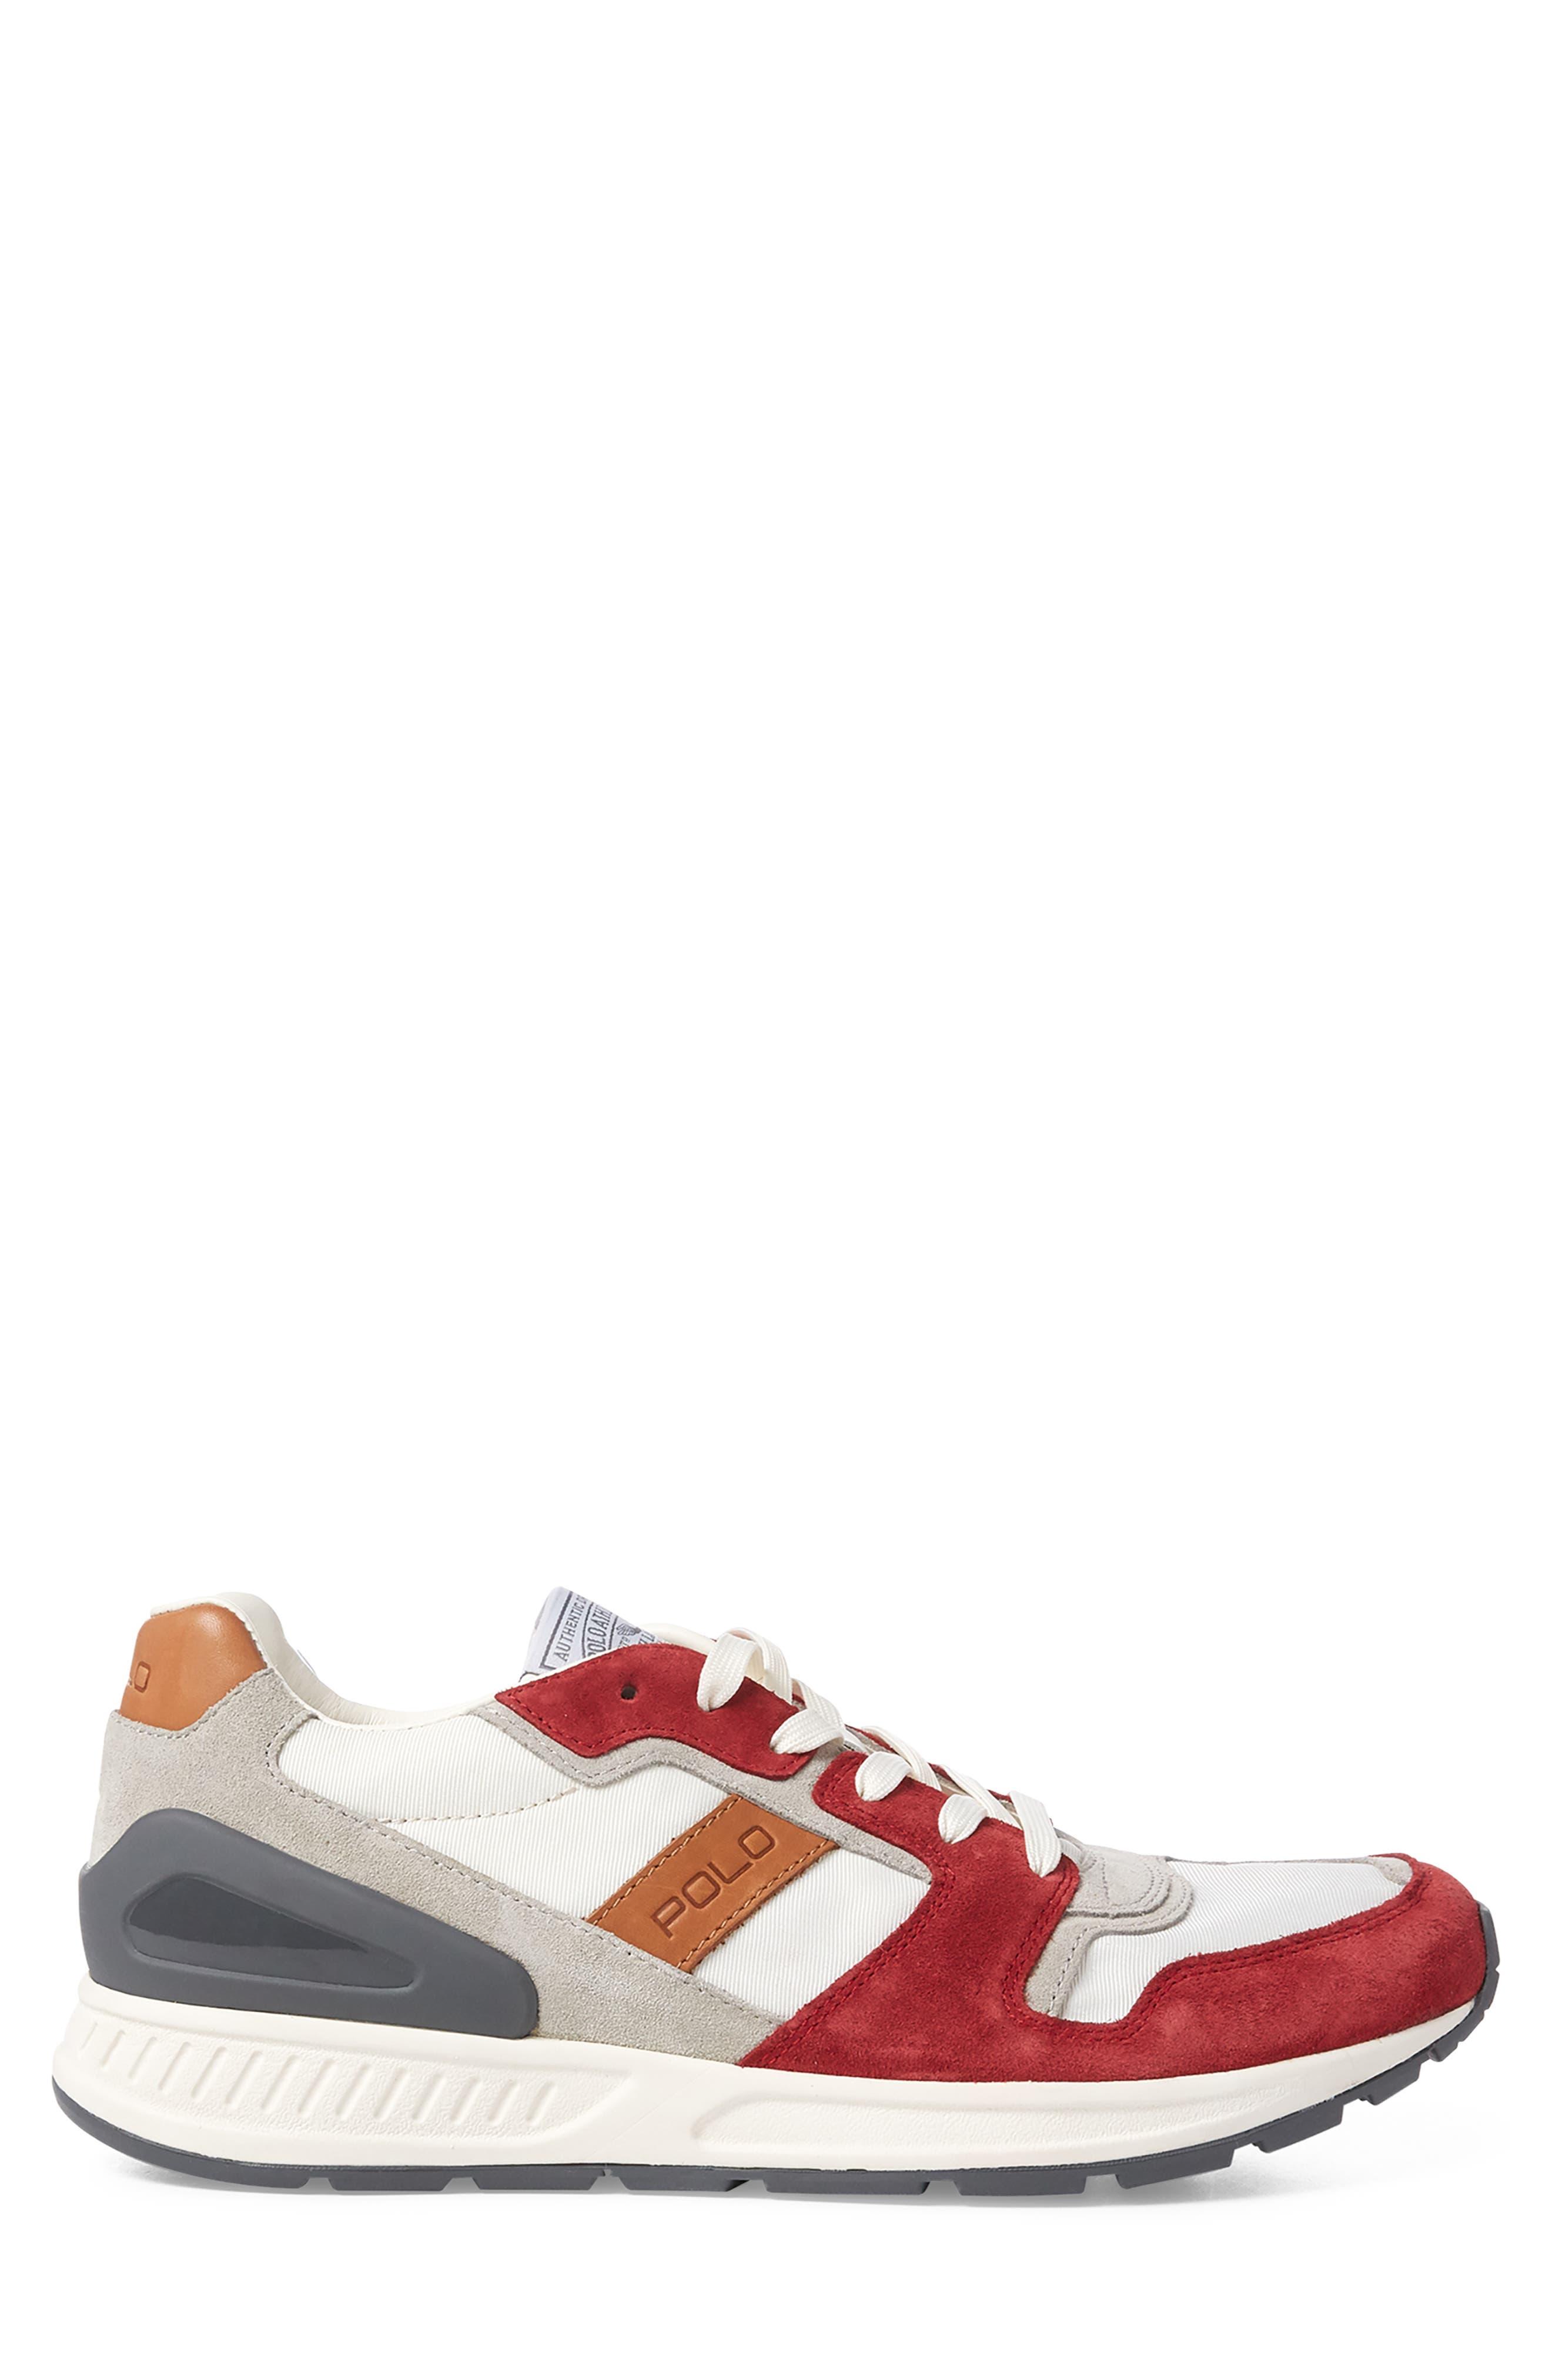 Train 100 Retro Sneaker,                             Alternate thumbnail 2, color,                             RED NYLON/ SUEDE